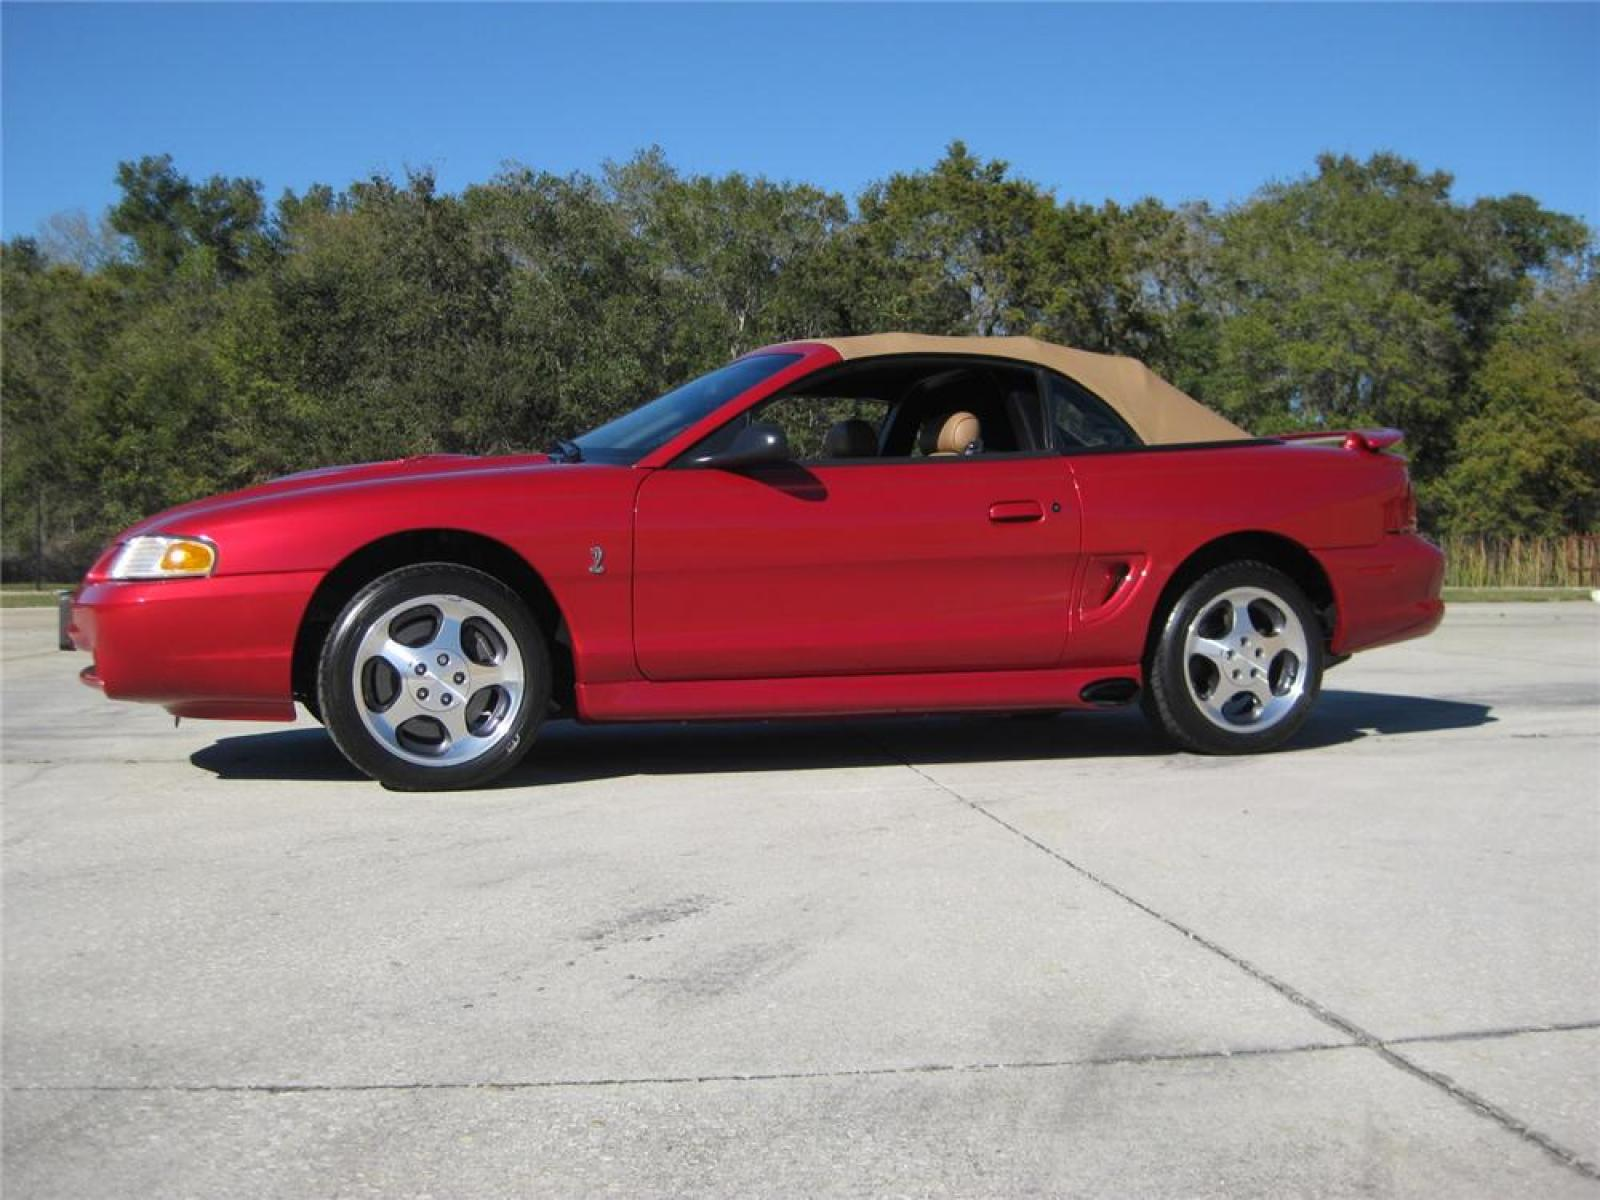 800 1024 1280 1600 Origin 1996 Ford Mustang Svt Cobra